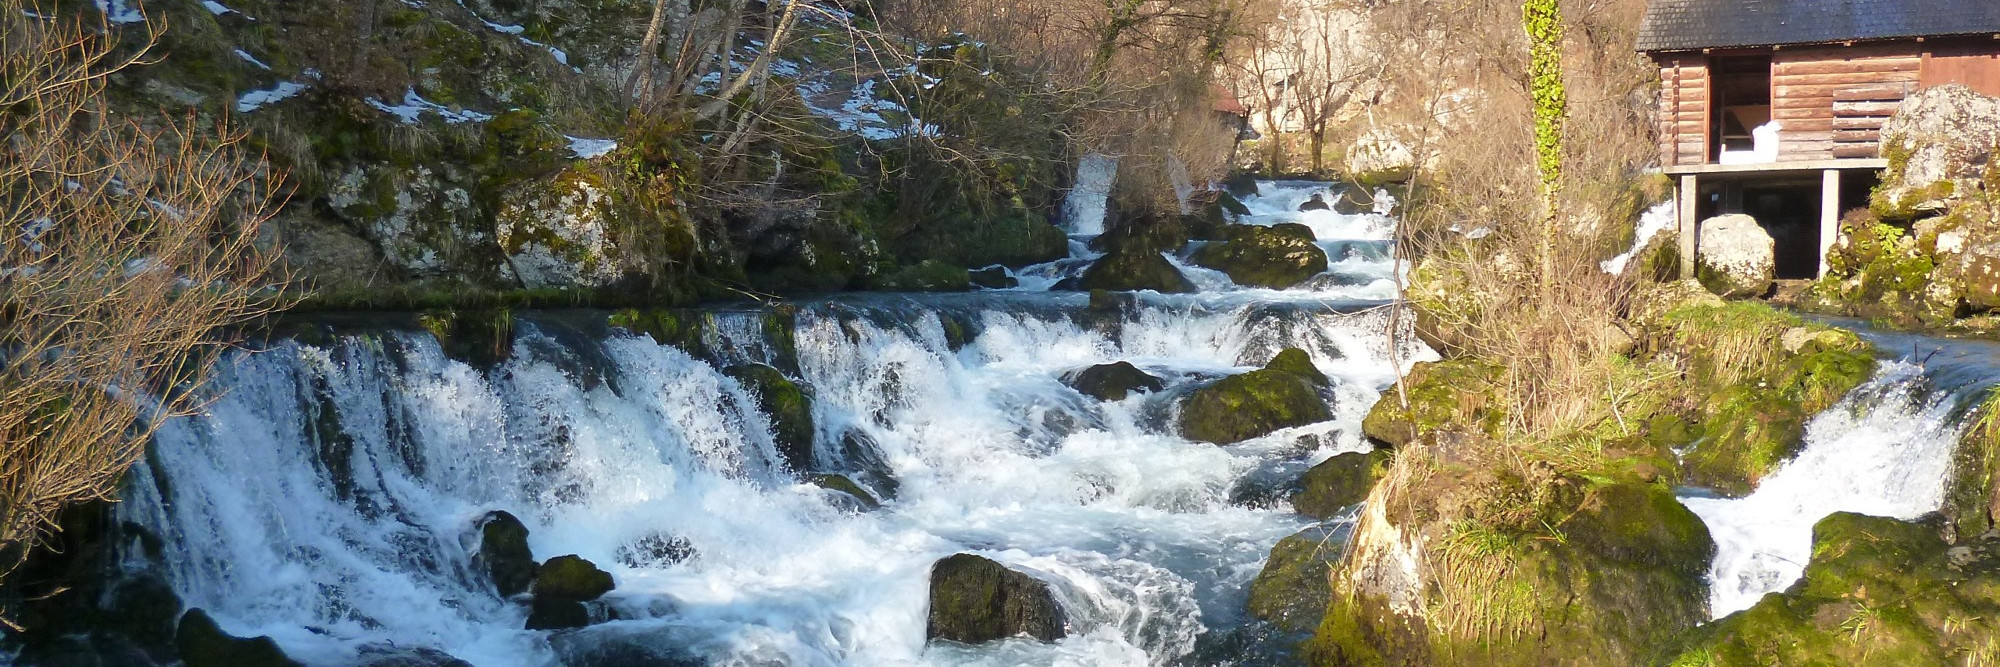 Водопады и мельницы на реке Крупе